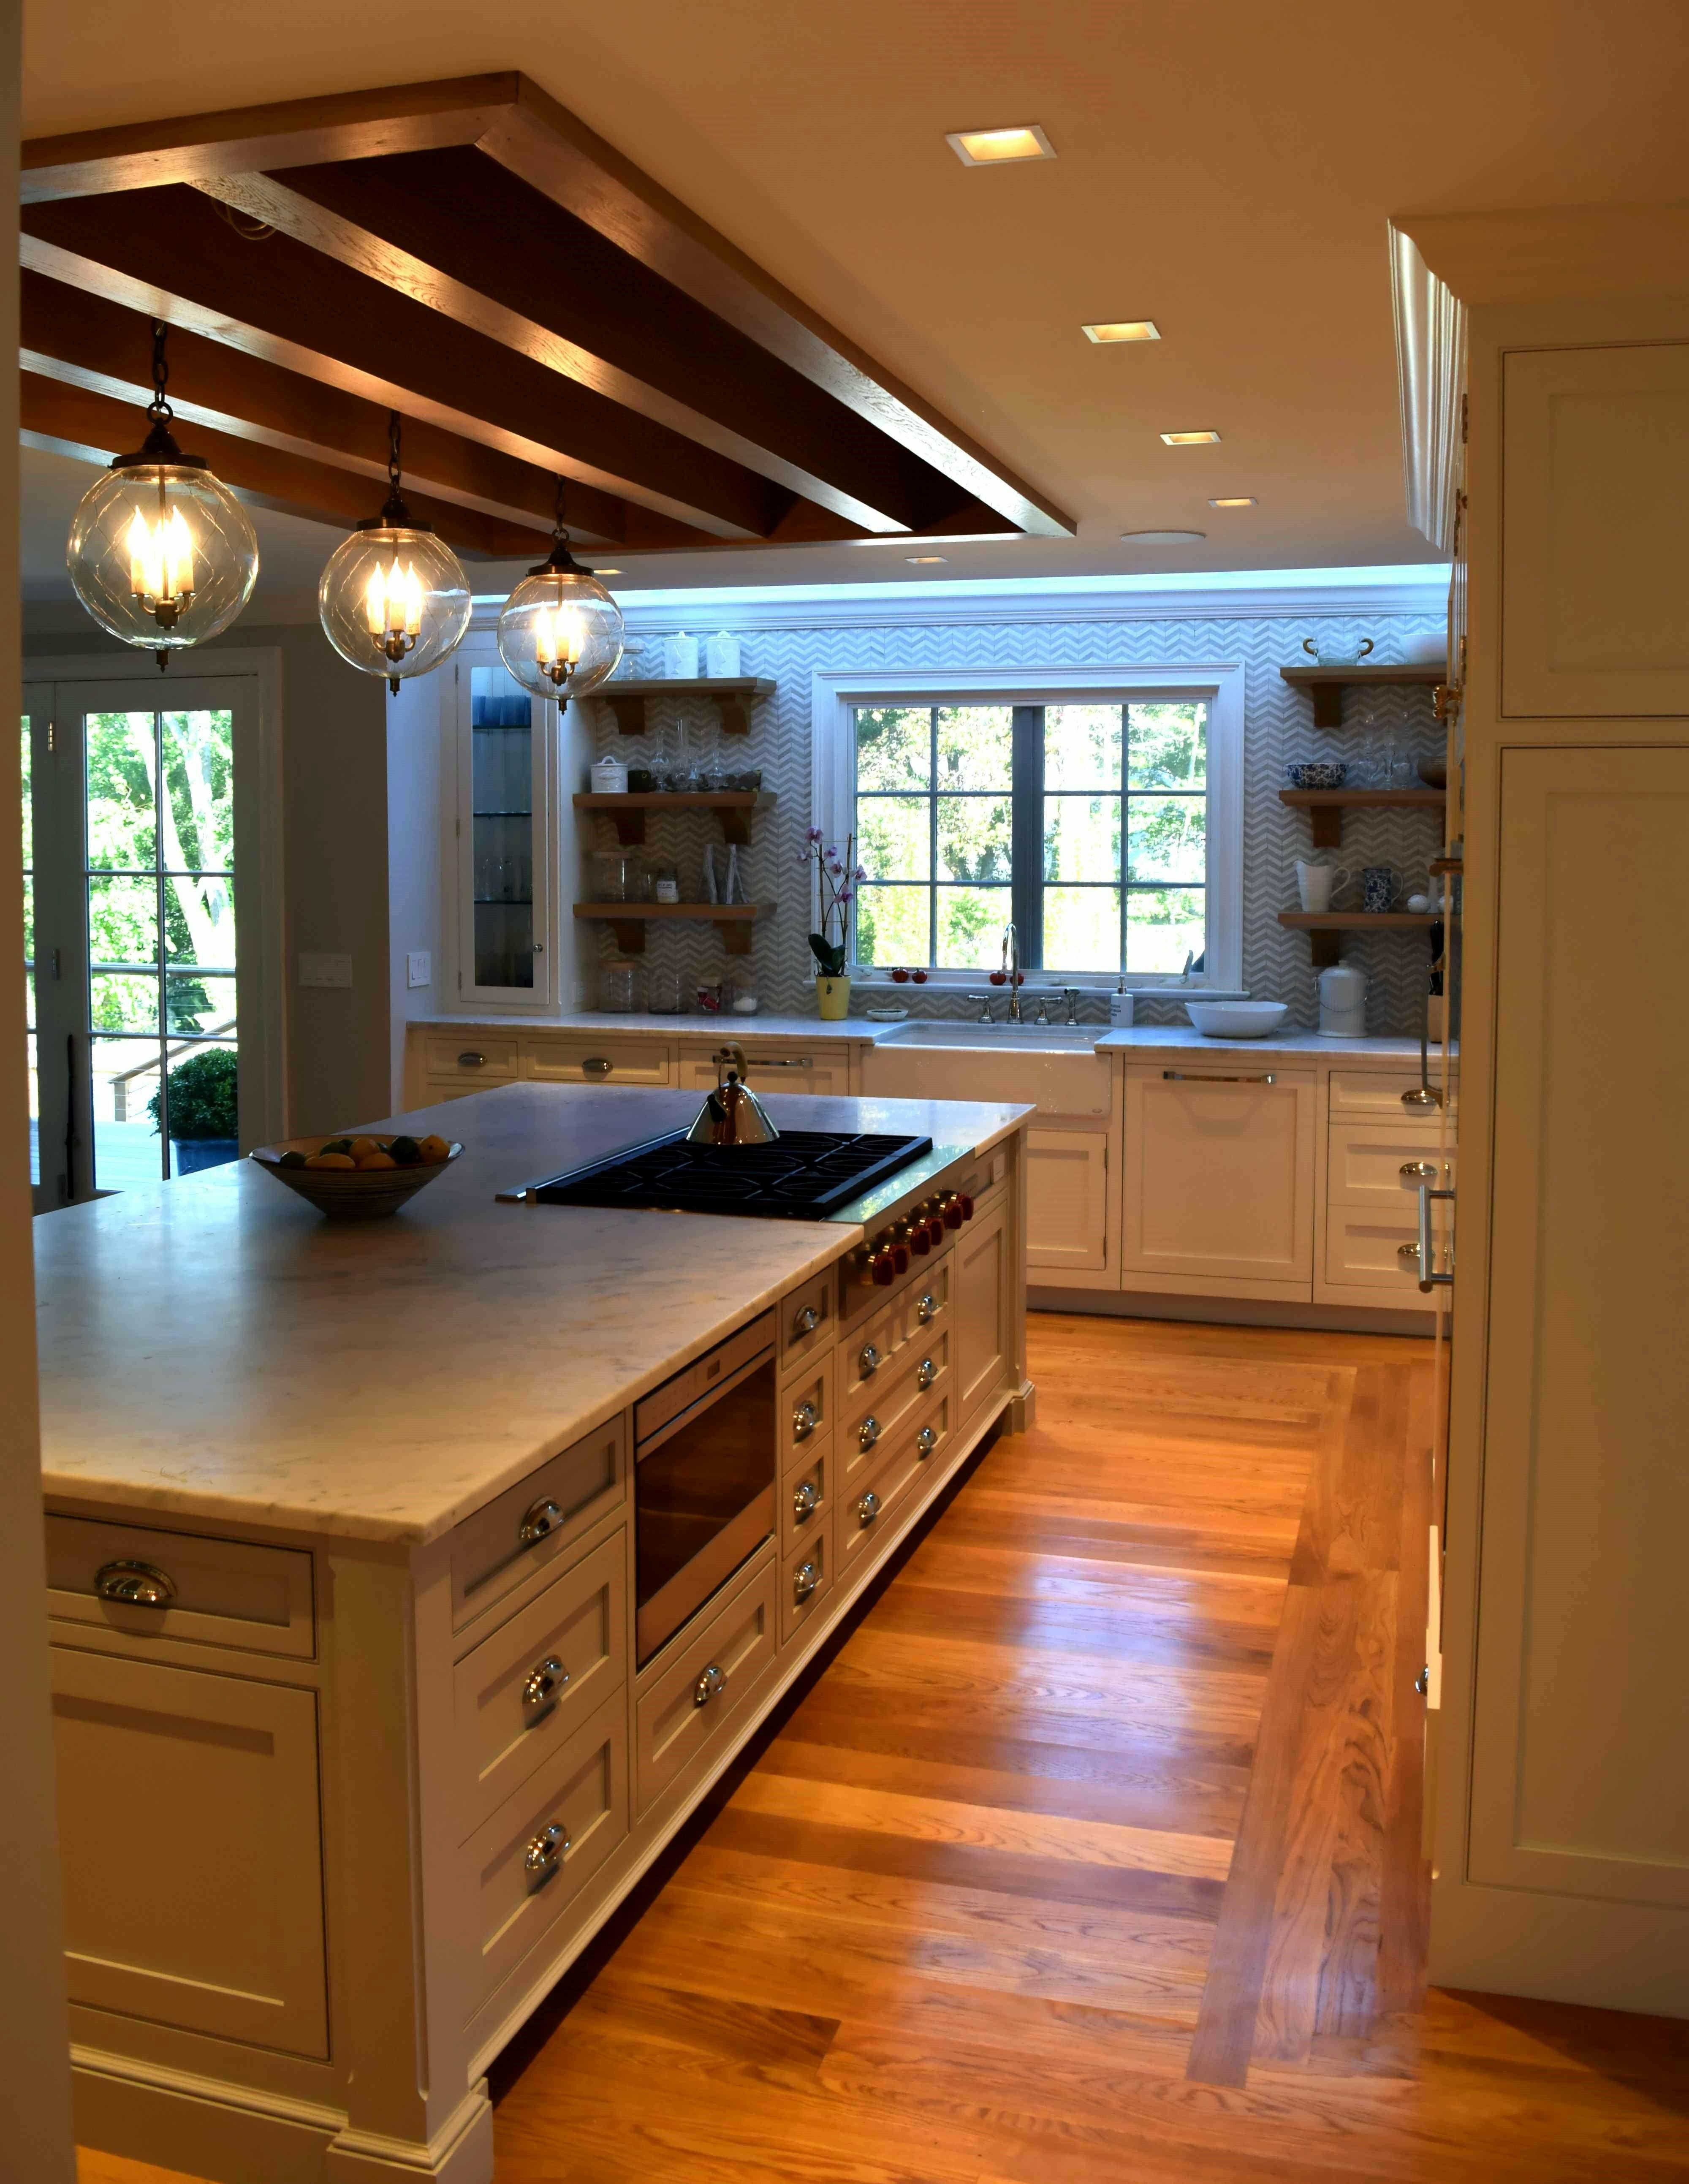 Pin By Koko B On Kitchen In 2020 Custom Kitchen Cabinets Custom Kitchen Island Custom Kitchen Cabinets Design